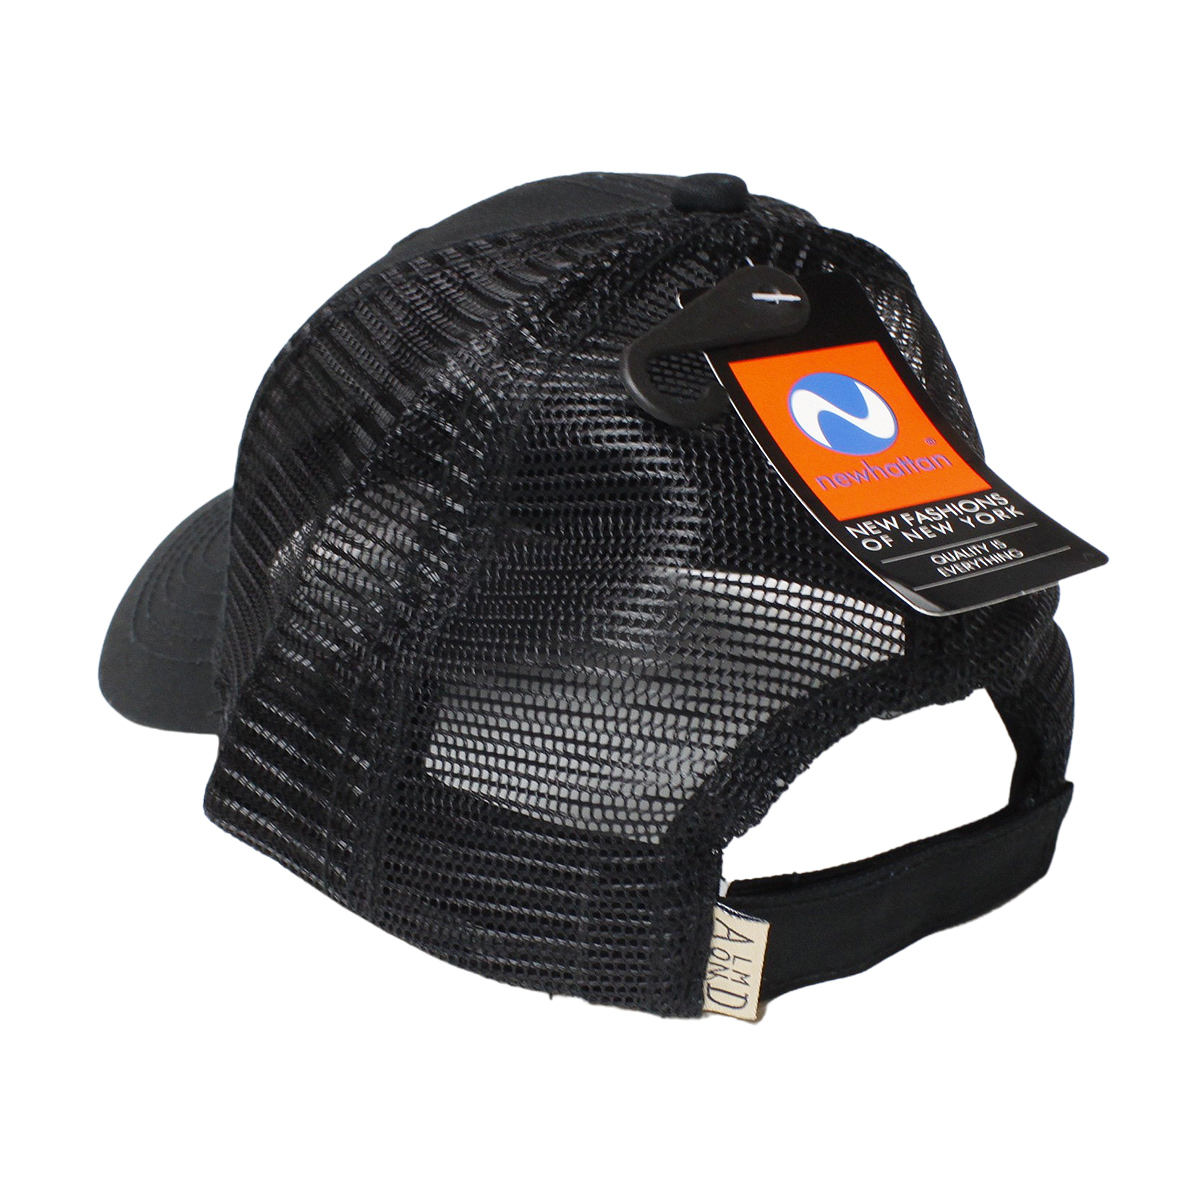 Almond Surf アーモンドサーフボードデザイン DECADES TRUCKER MESH CAP